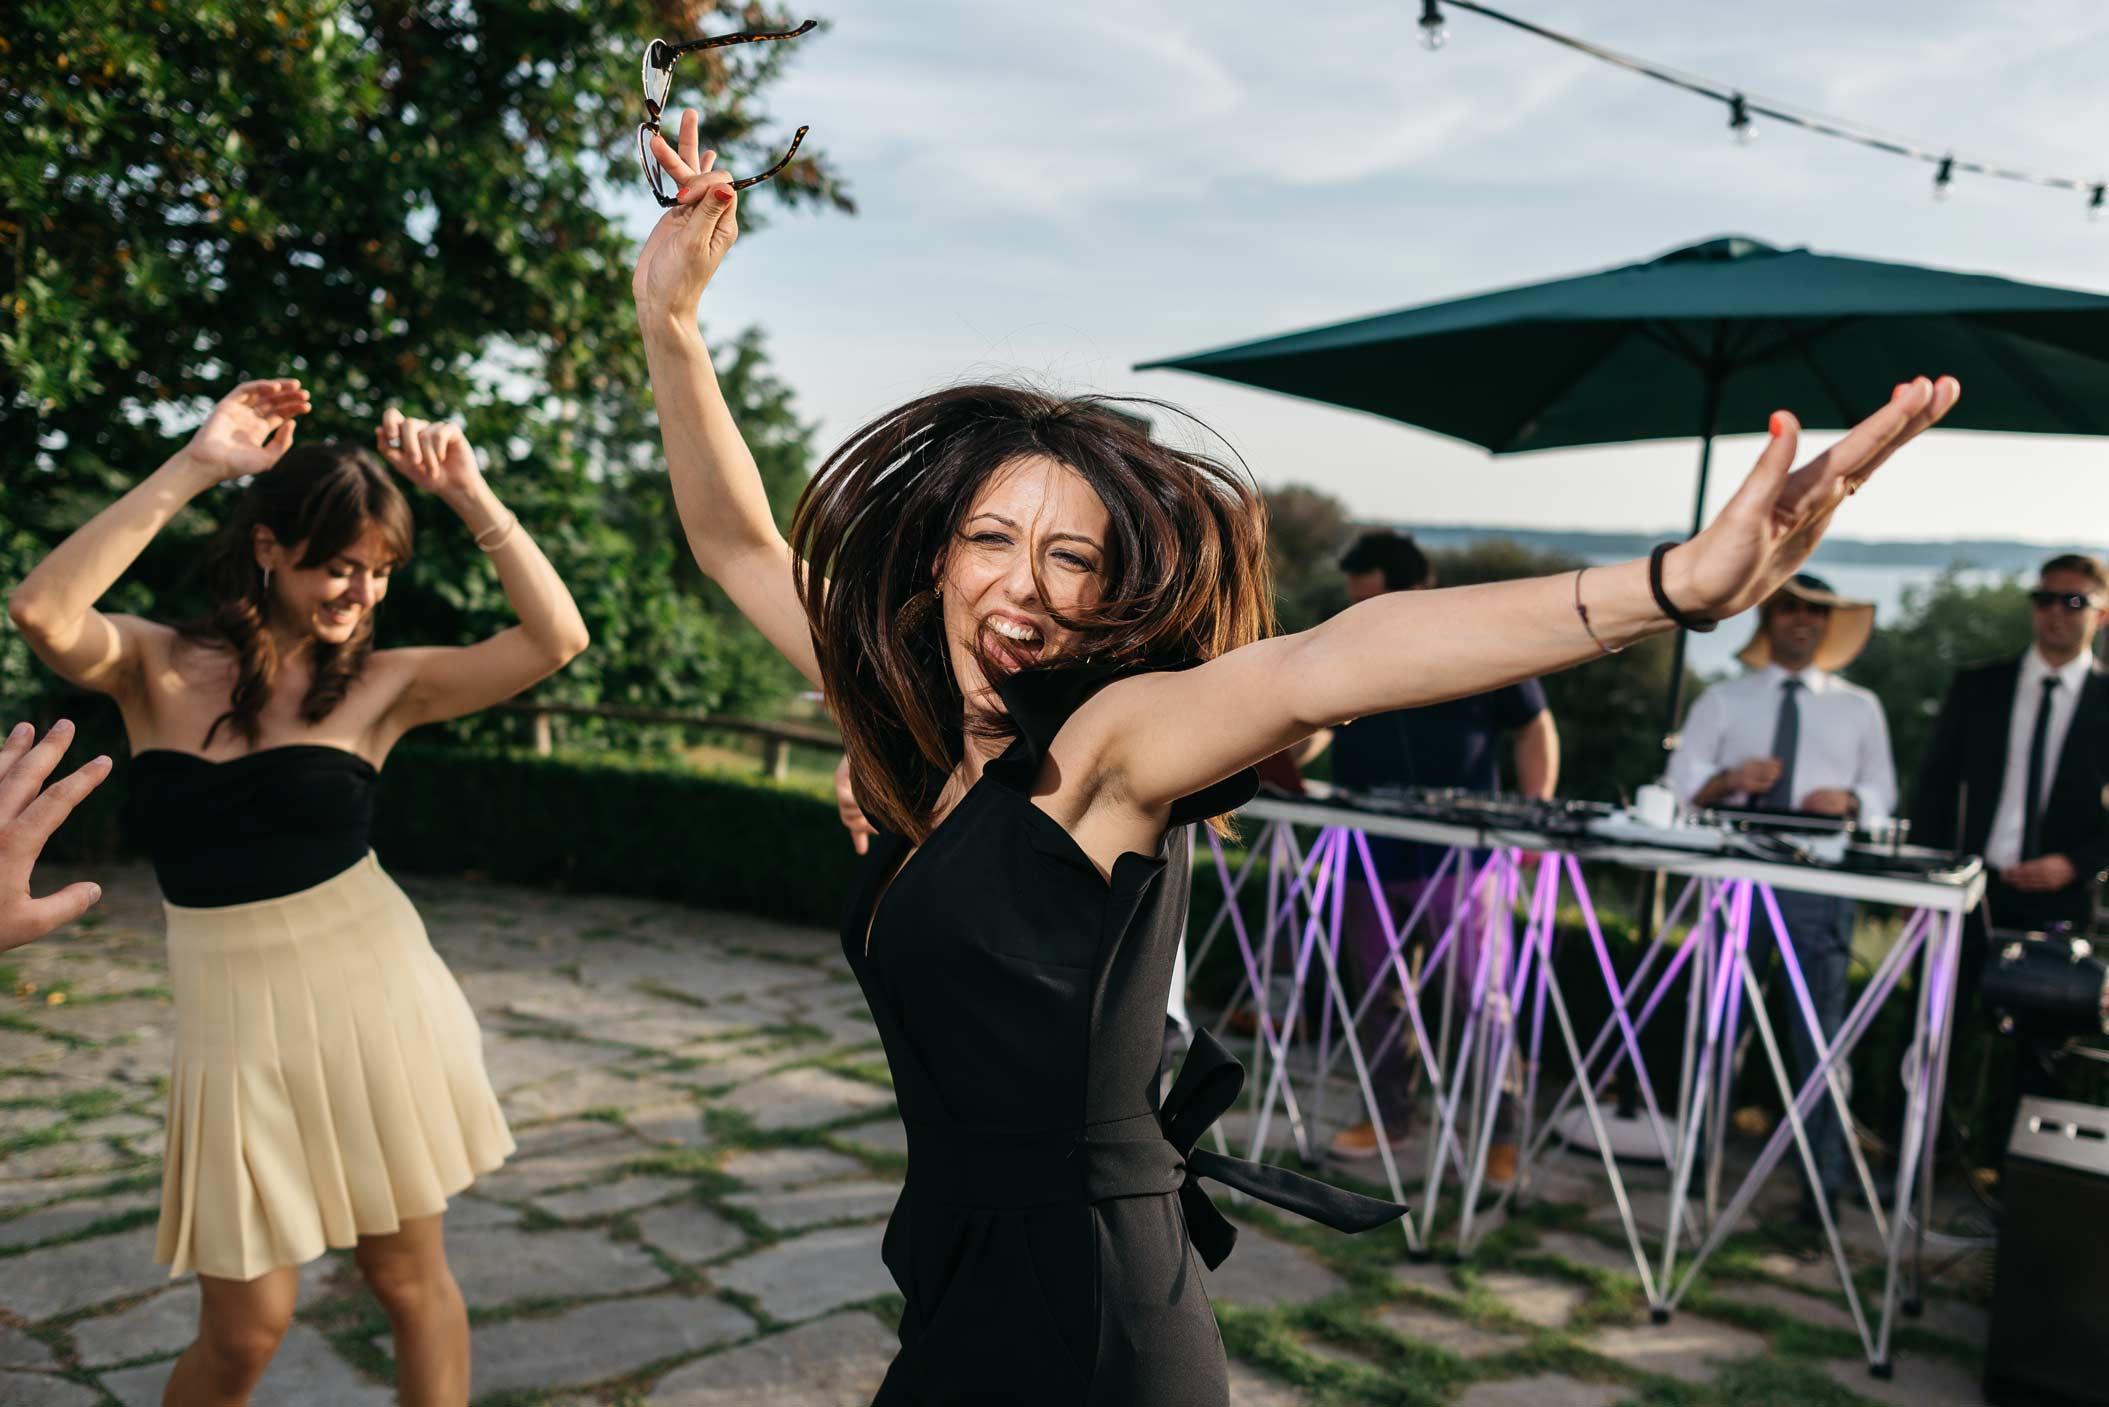 Reportage-Matrimonio-Fotografo-Roma-Festa-Party